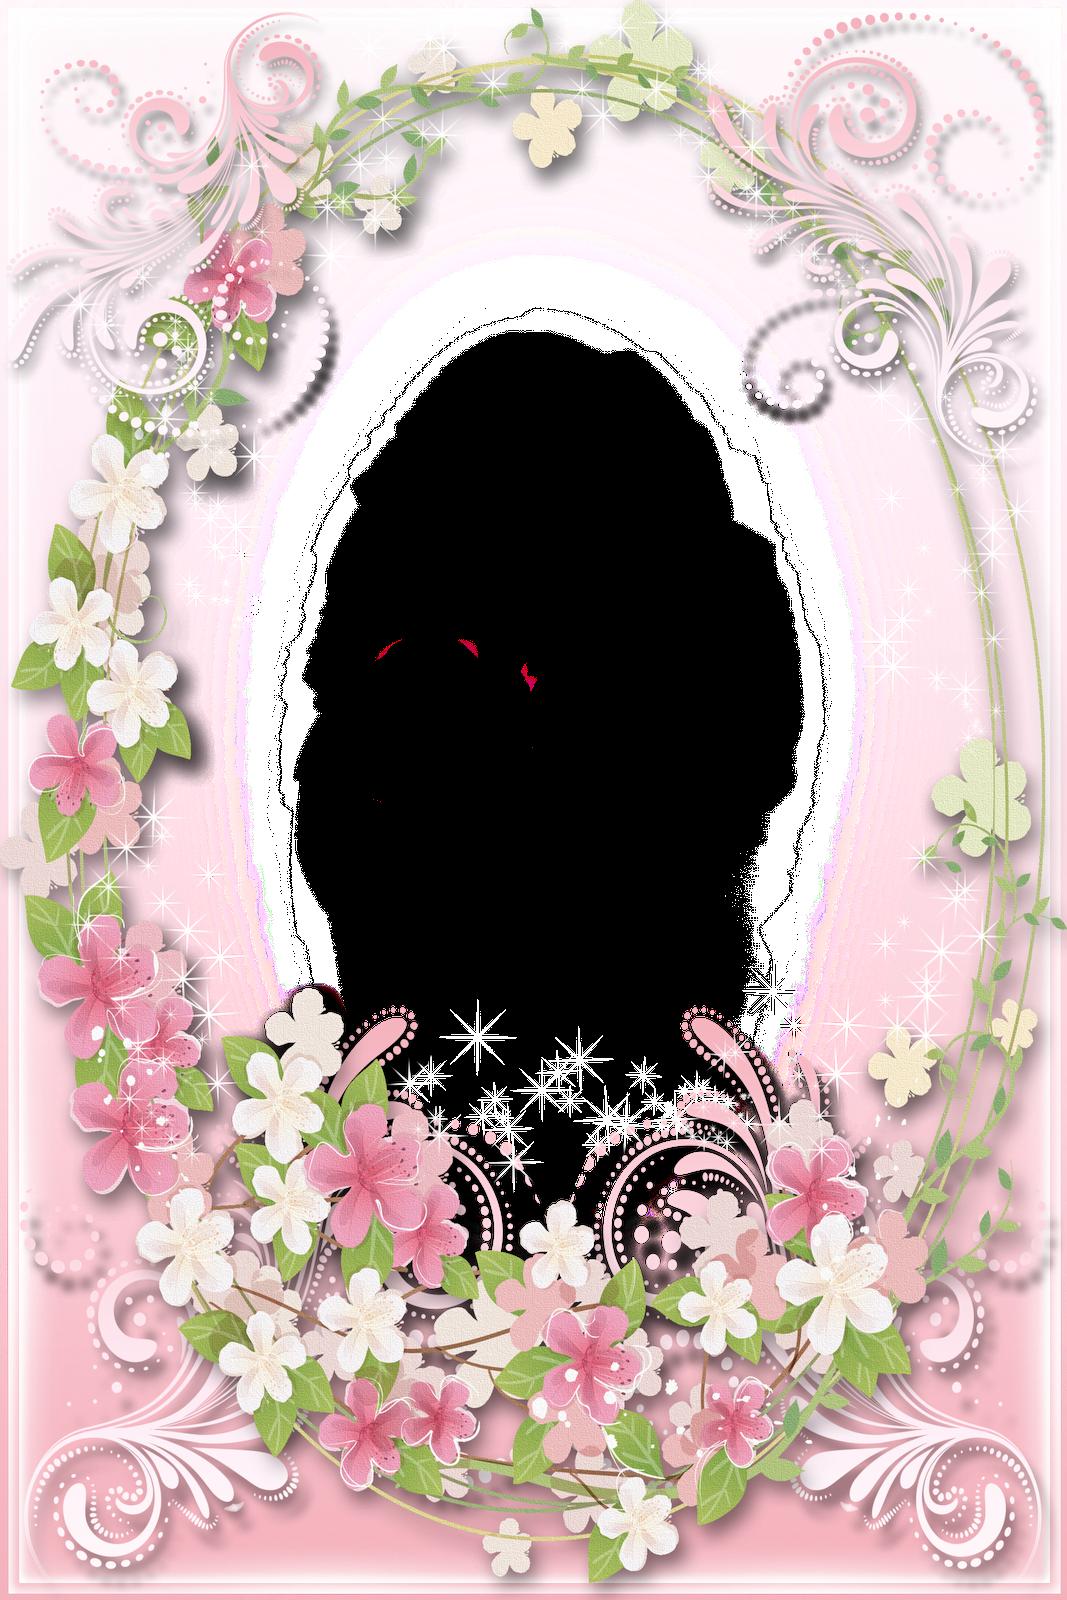 Transparent soft flowers frame. Clipart plane pink